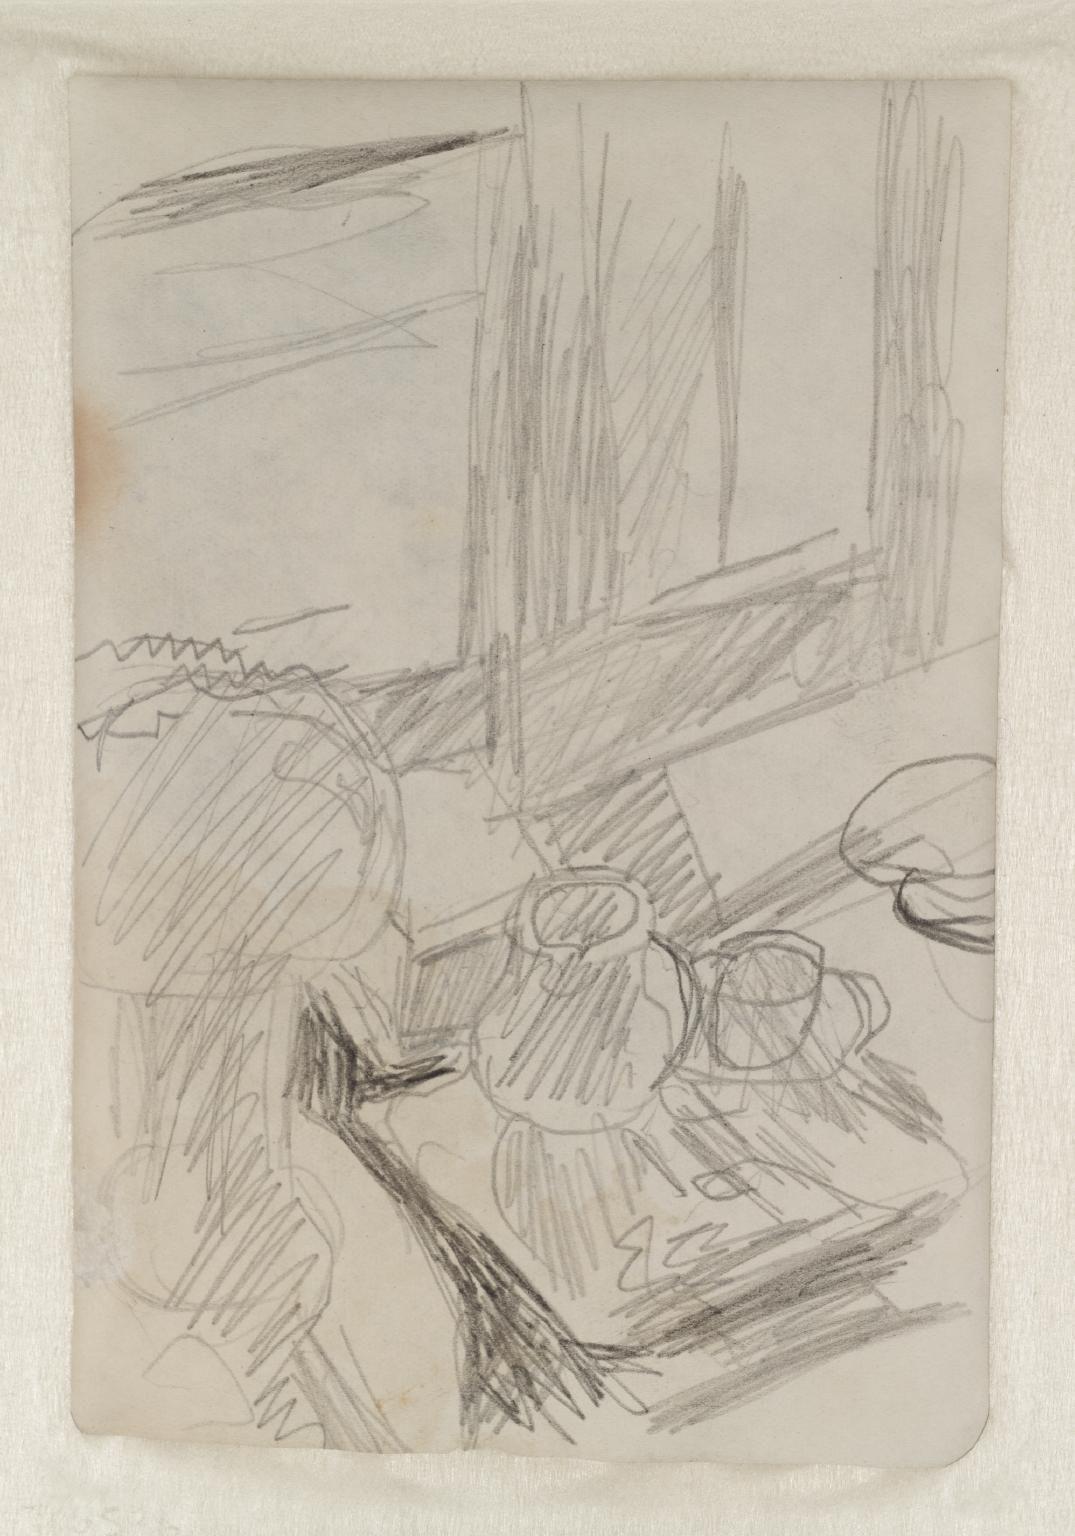 Pierre Bonnard 'Preparatory Sketch for 'The Bowl of Milk'', c.1919 © ADAGP, Paris and DACS, London 2016